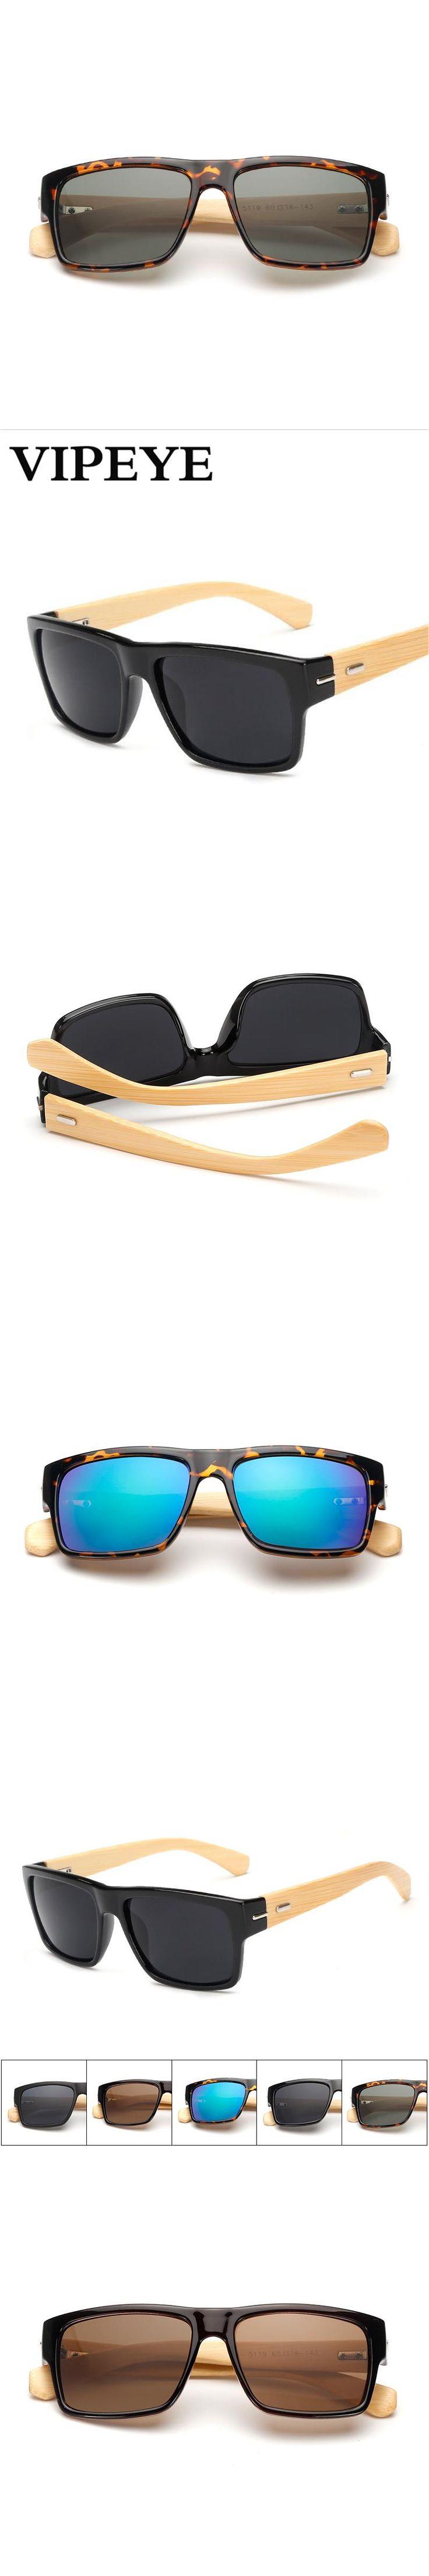 5 Color Handmade Bamboo Sunglasses Women Brand Designer Anti-UV UV400 Square Mirror Sunglasses Vintage Sun Glasses for Women